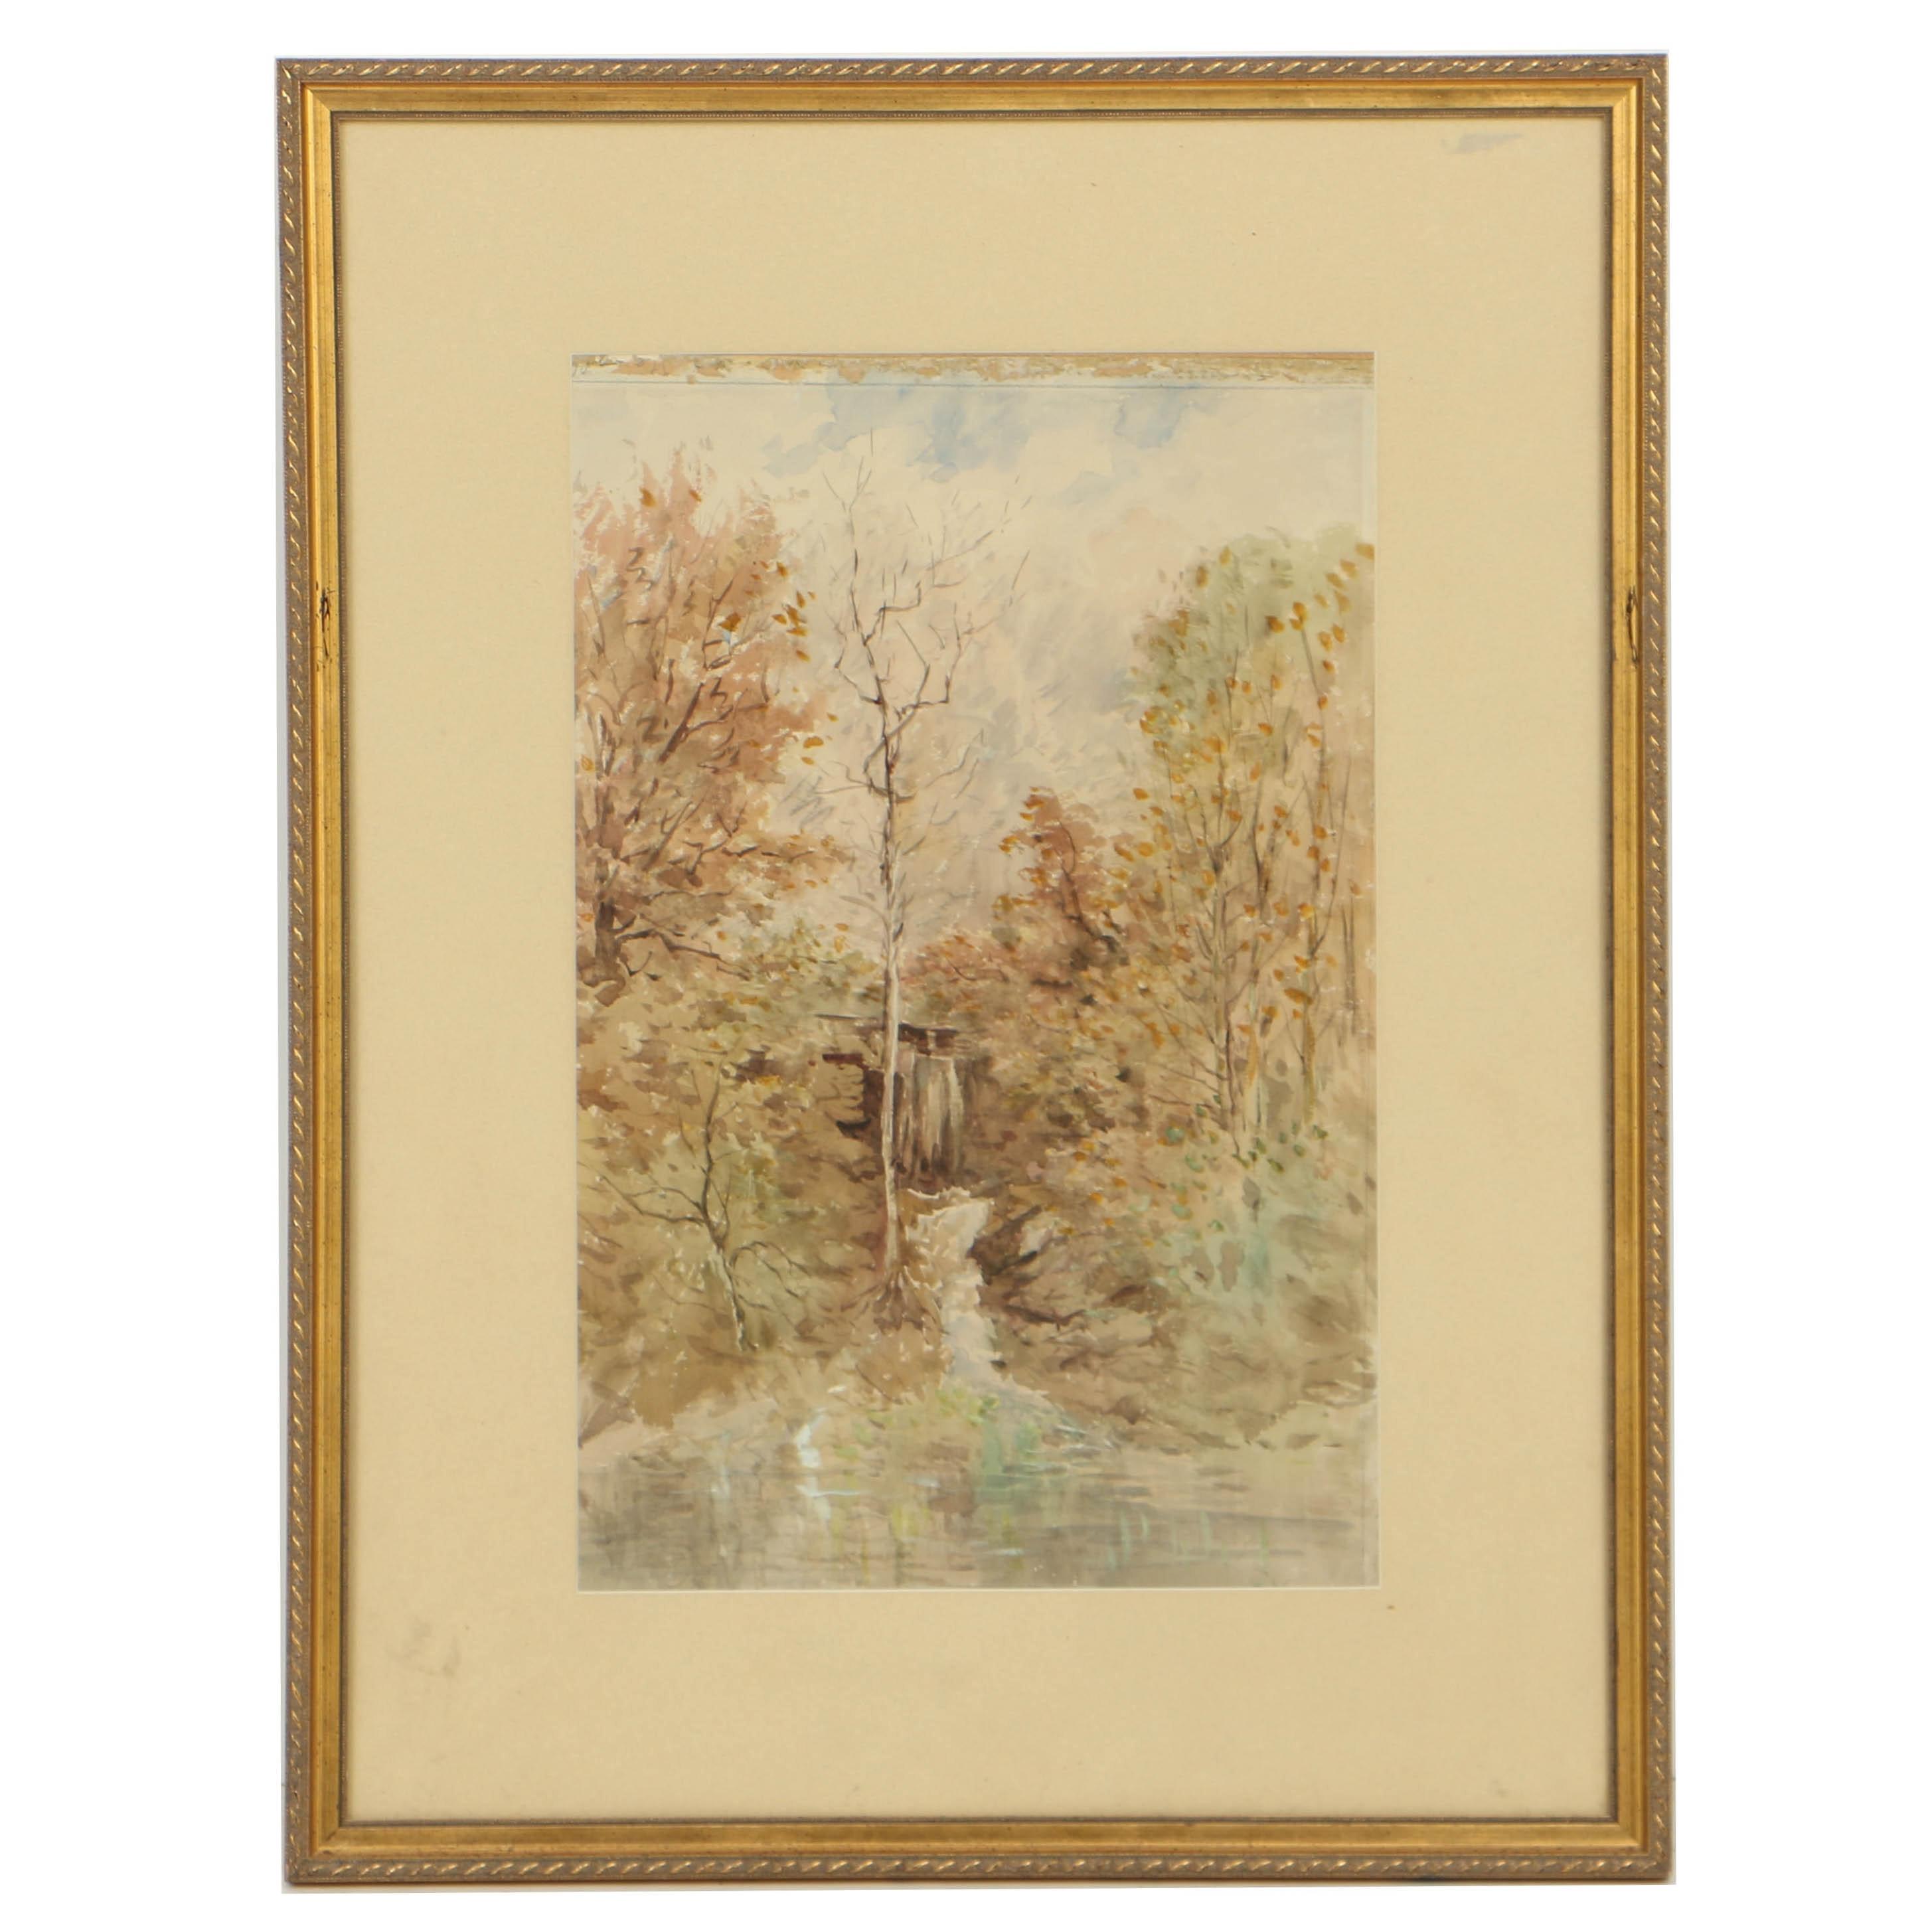 Hobart Nichols, Jr. Watercolor Painting Woodland Landscape